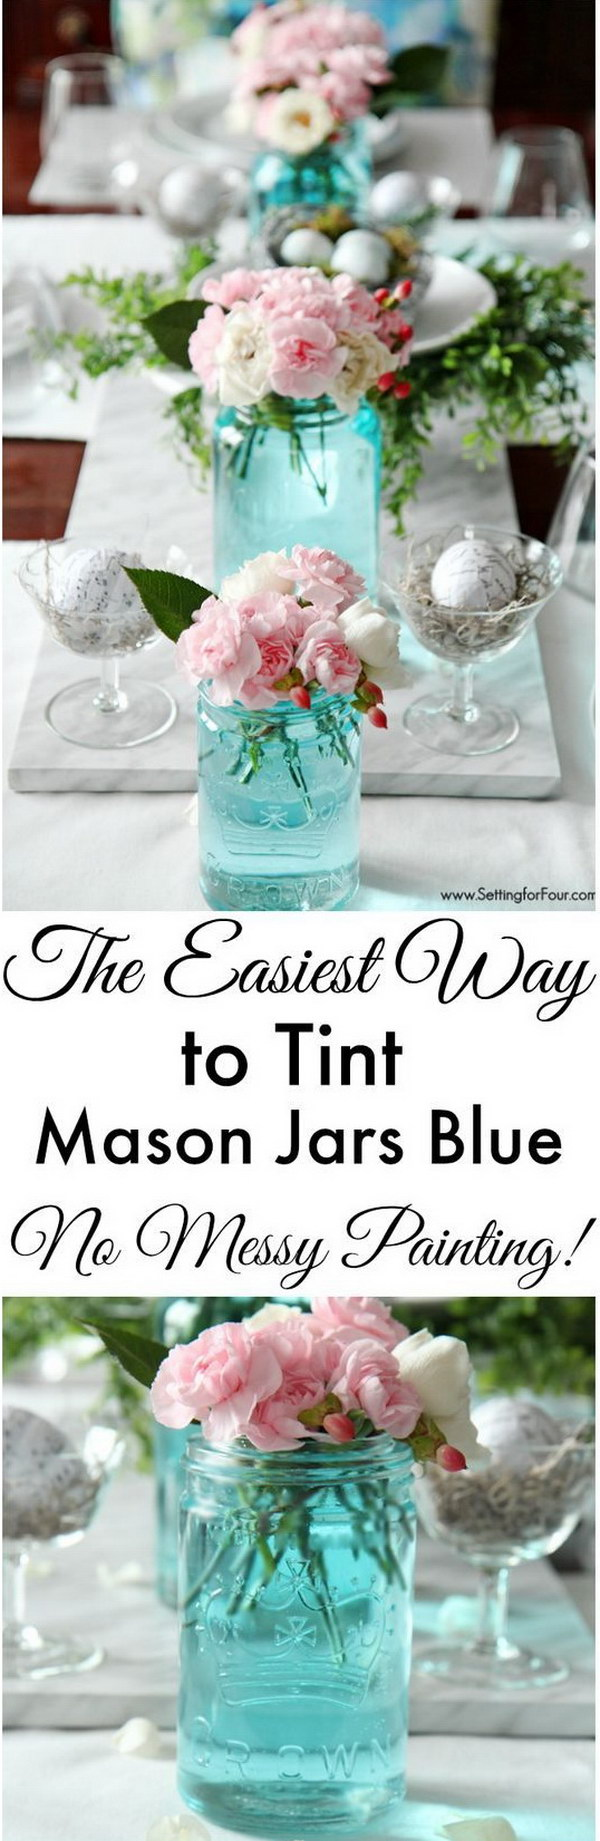 34 DIY Mason Jar Centerpieces